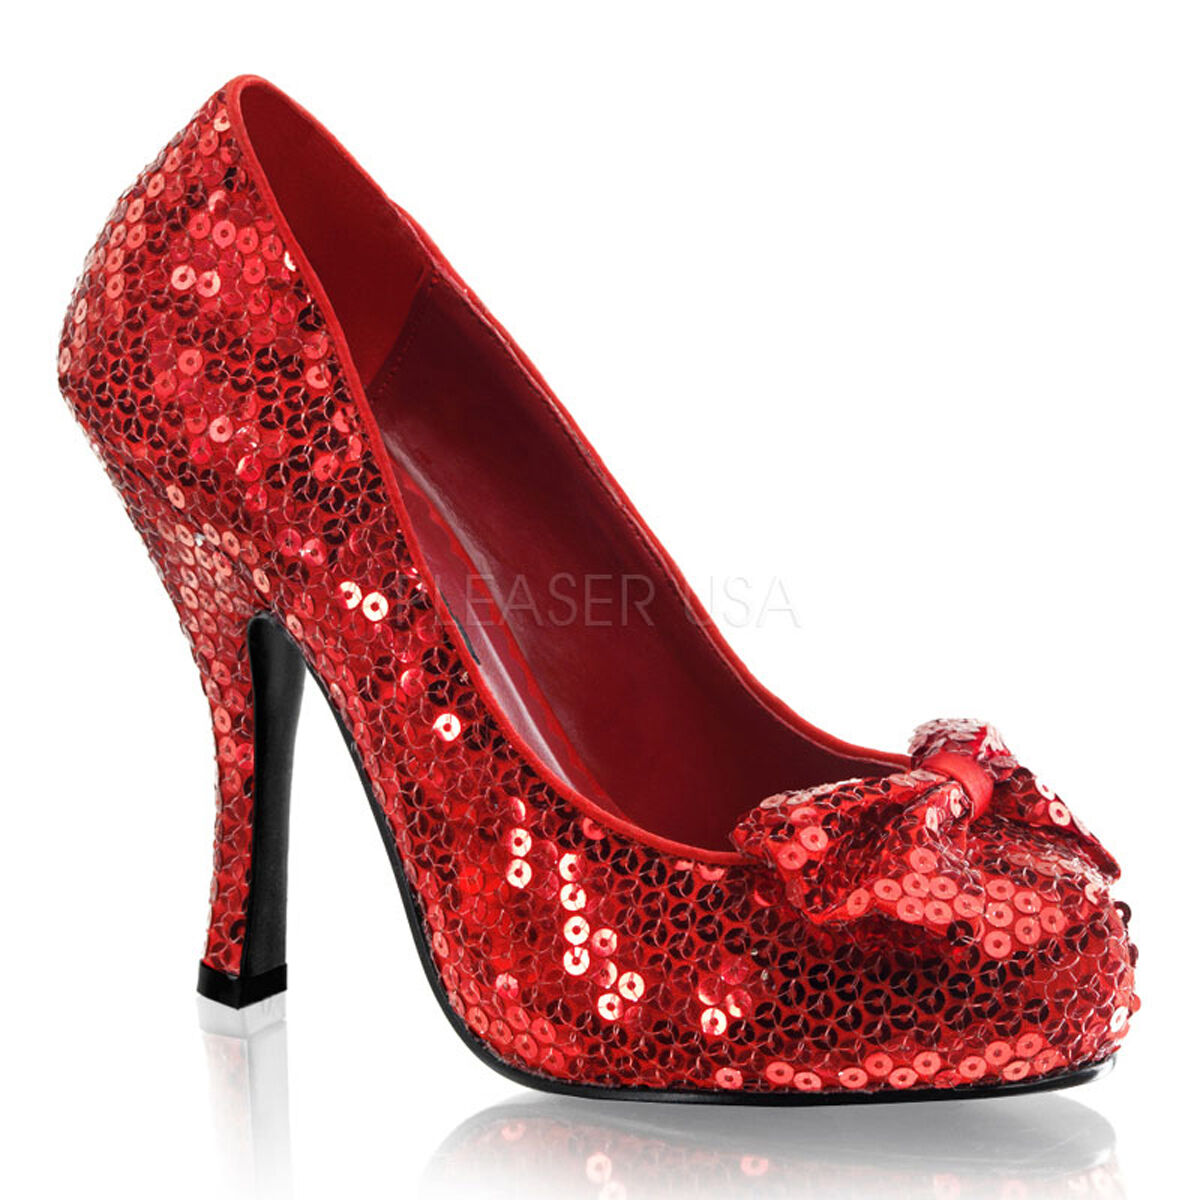 Sexy rouge Sequin Dorrthy Wizard Halloween Costume Pumps Heels chaussures OZ06 RSQ